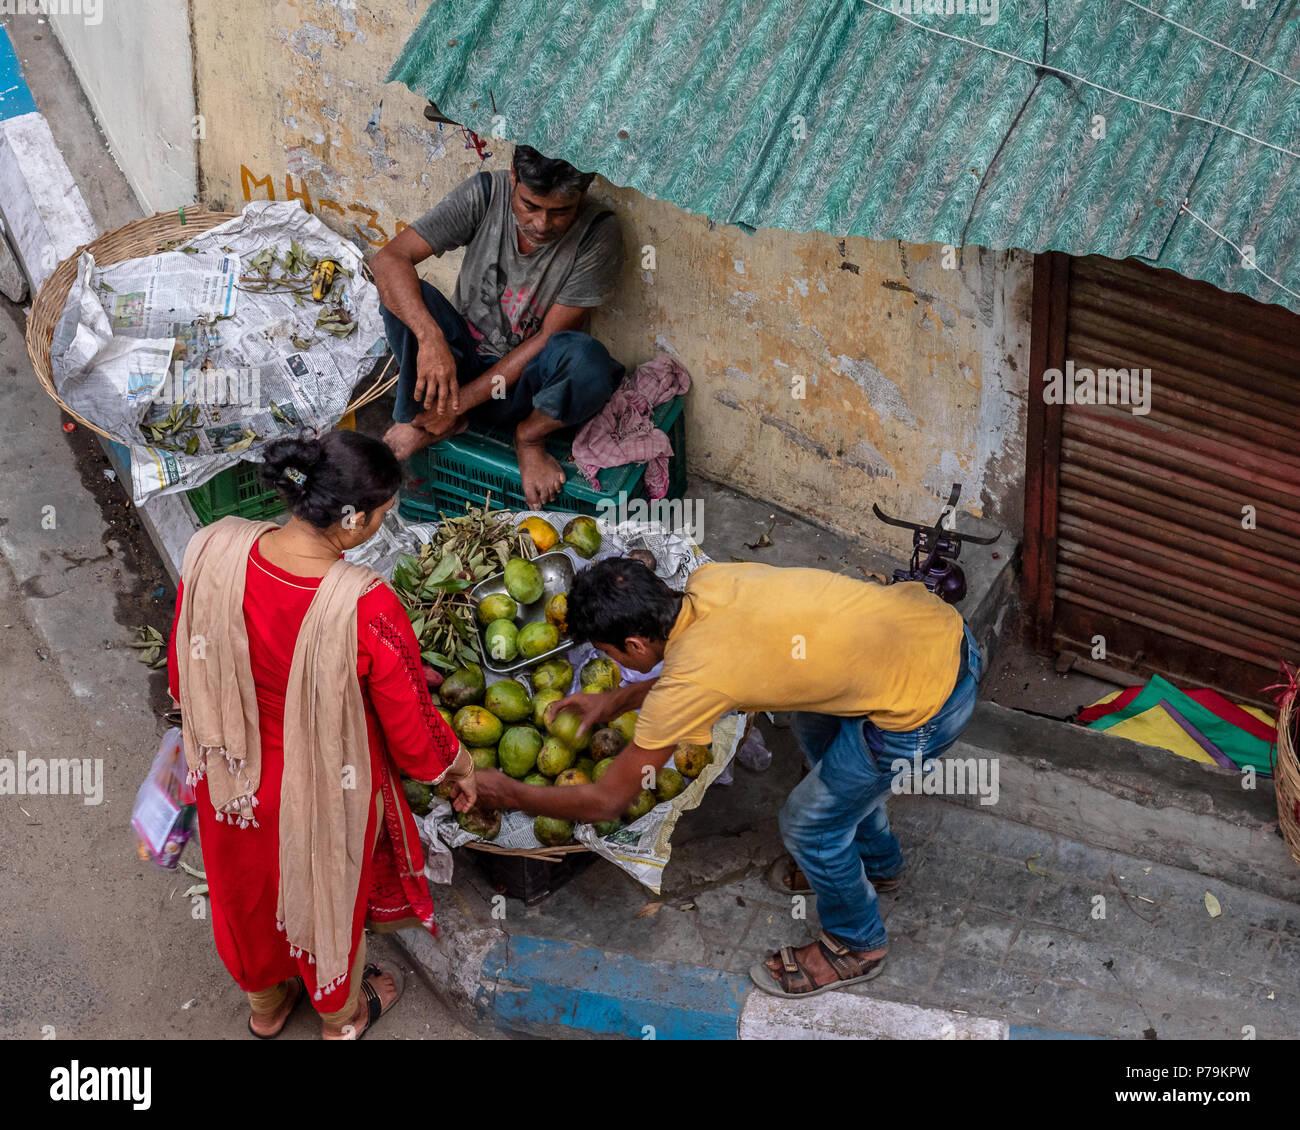 June 19,2018. Kolkata,India. Fruit seller selling fruits on the roadside at Kolkata. - Stock Image